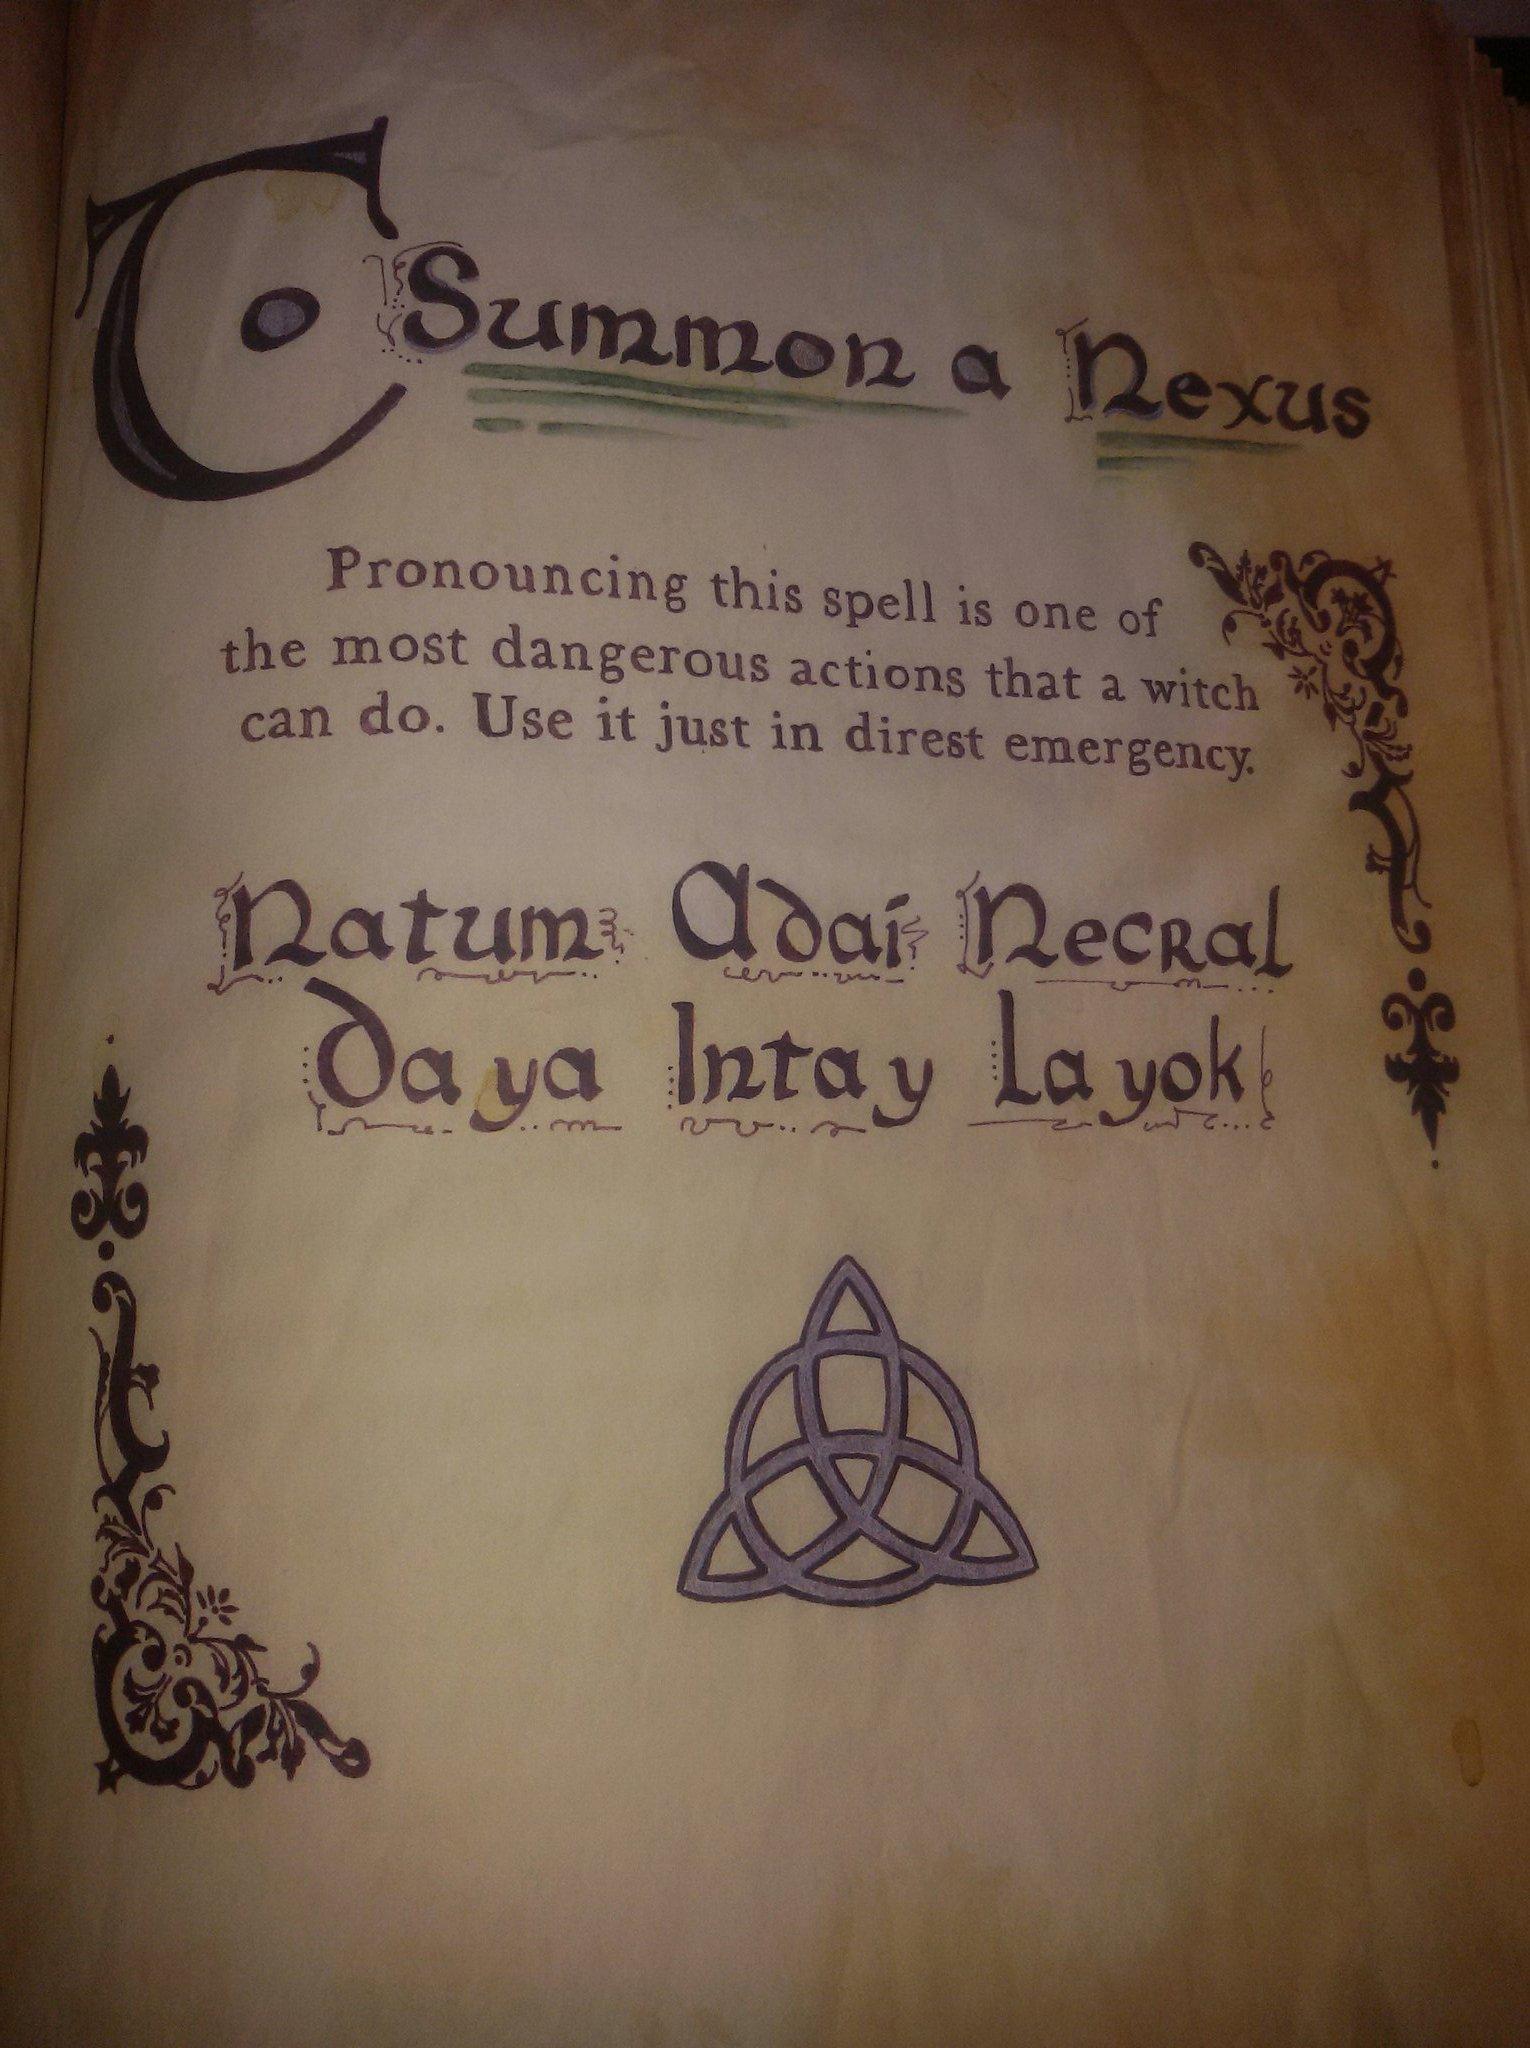 Charmed Siempre Ogcharmed On Twitter Tosummonthenexus Tosummontheshadow Woogyman Charmed Bos Spells S5e11 99th Natum Adai Necral Daya Intay Layok Https T Co K0otoentxk